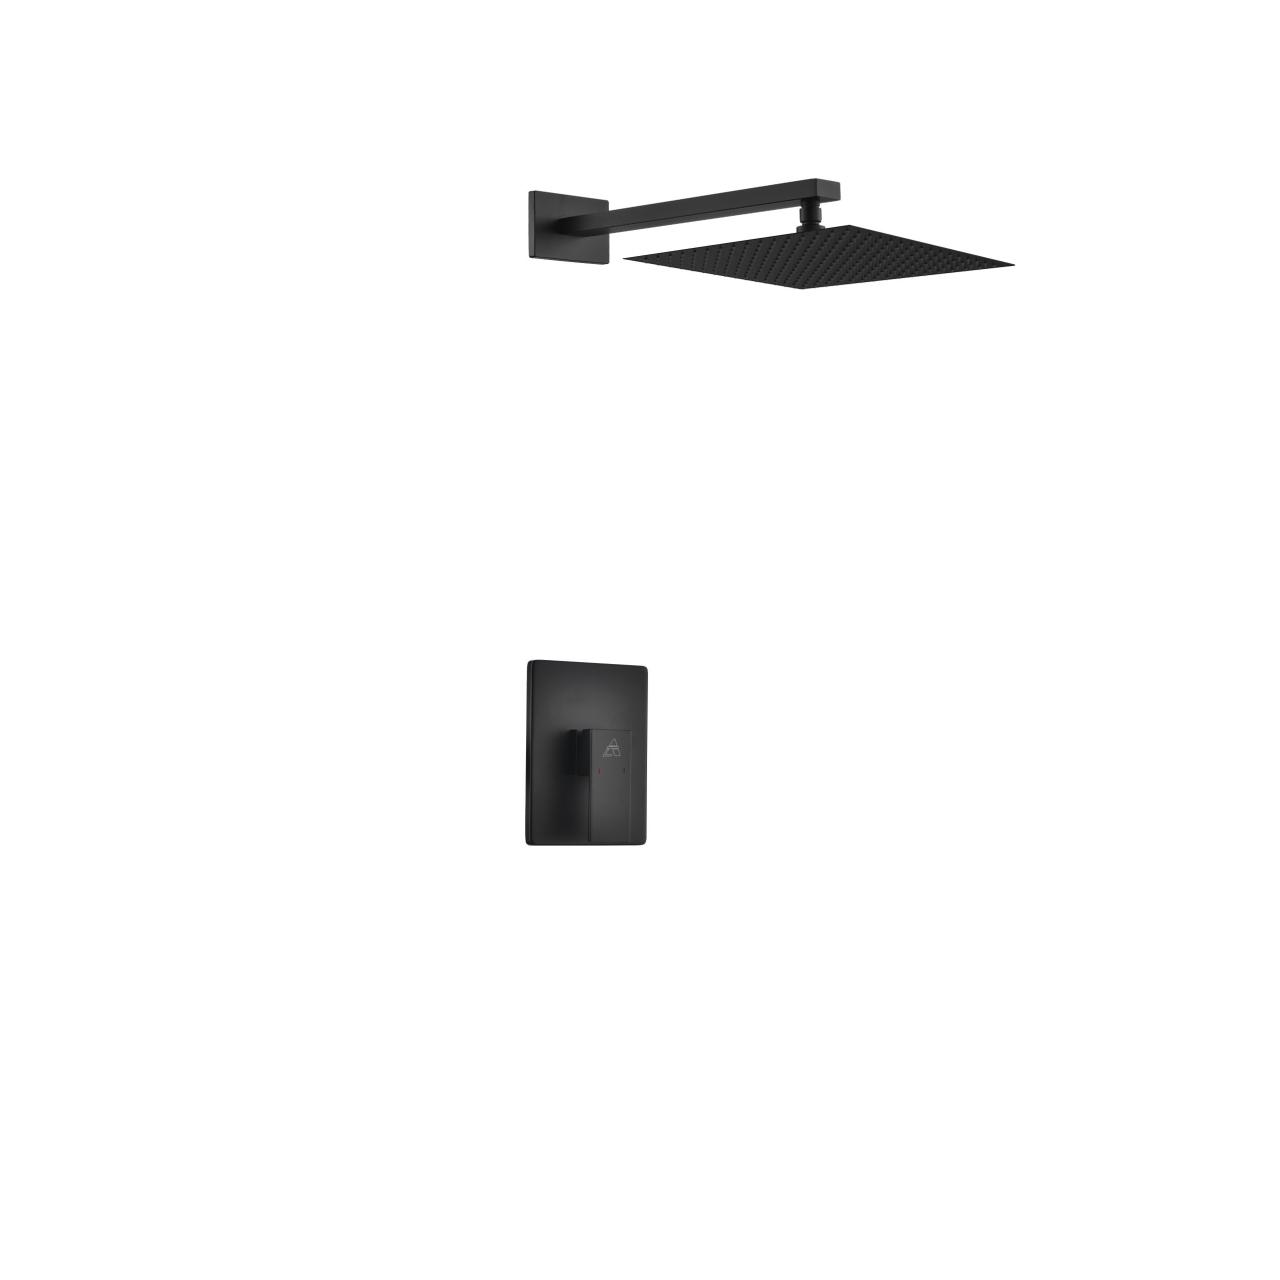 Aqua Piazza Black Shower Set W 12 Square Rain Shower Head